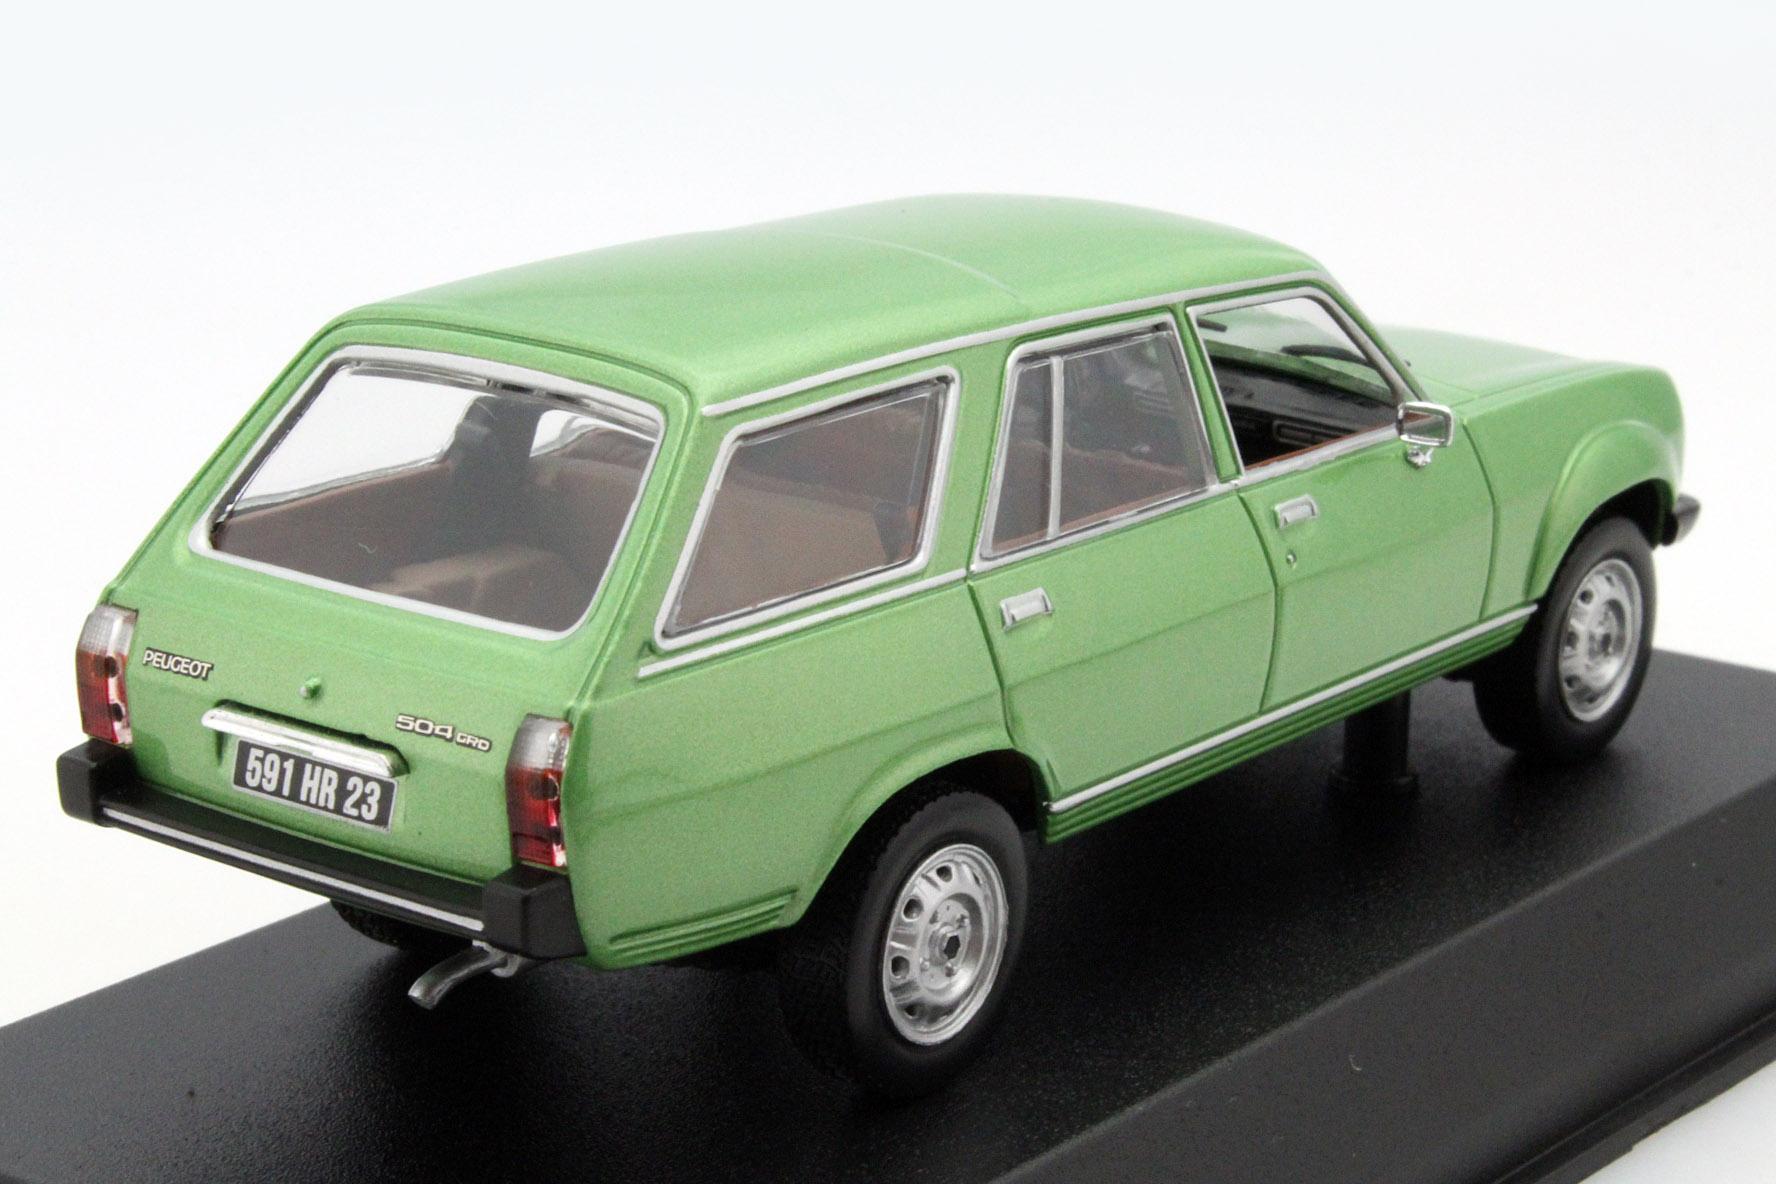 peugeot 504 break dangel 1980 green metallic die cast model norev 475430. Black Bedroom Furniture Sets. Home Design Ideas